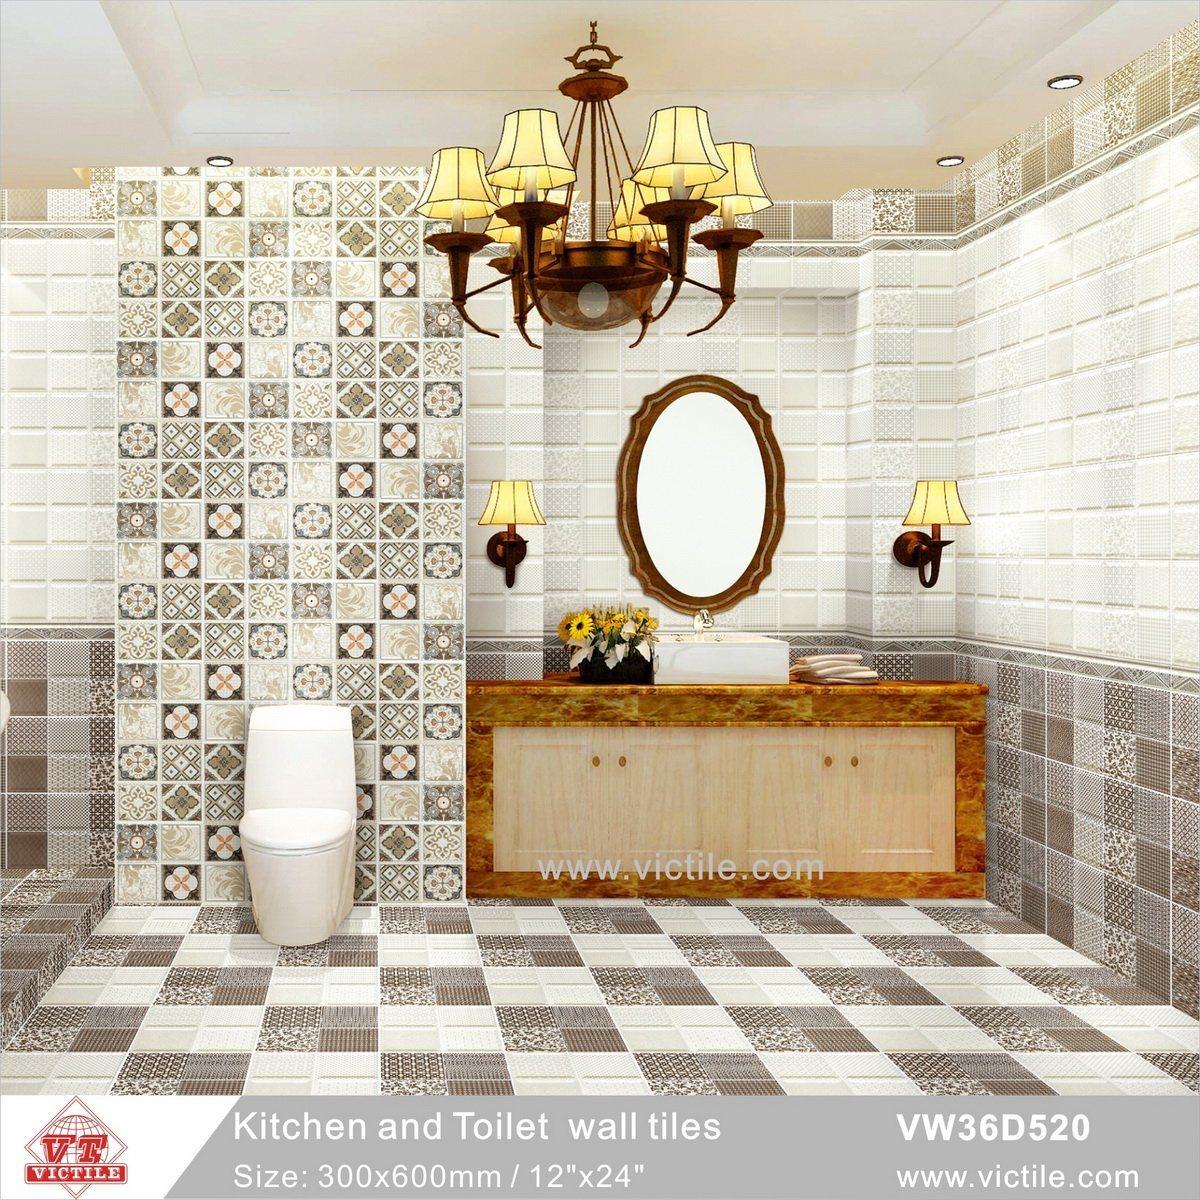 . Hot Item  New Arrival Decoration Ceramic Wall Kitchen Bathroom Pattern  Tile  VW36D520  300X600mm 12  x24